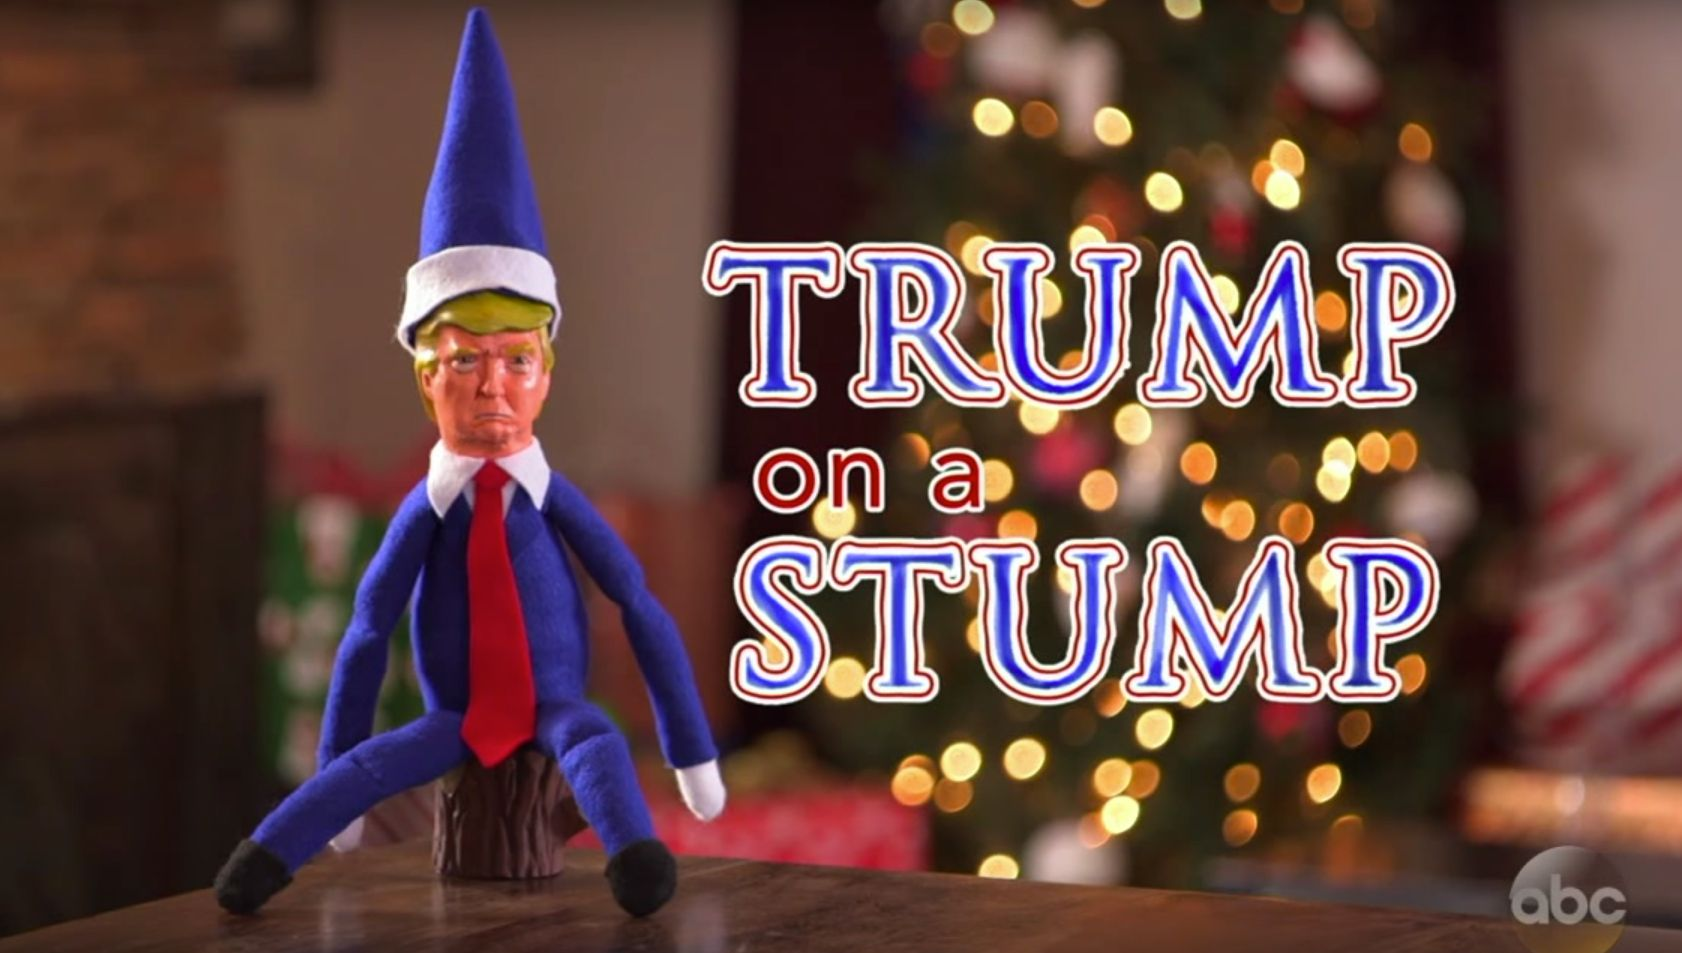 Top Trumps Elf on the shelf